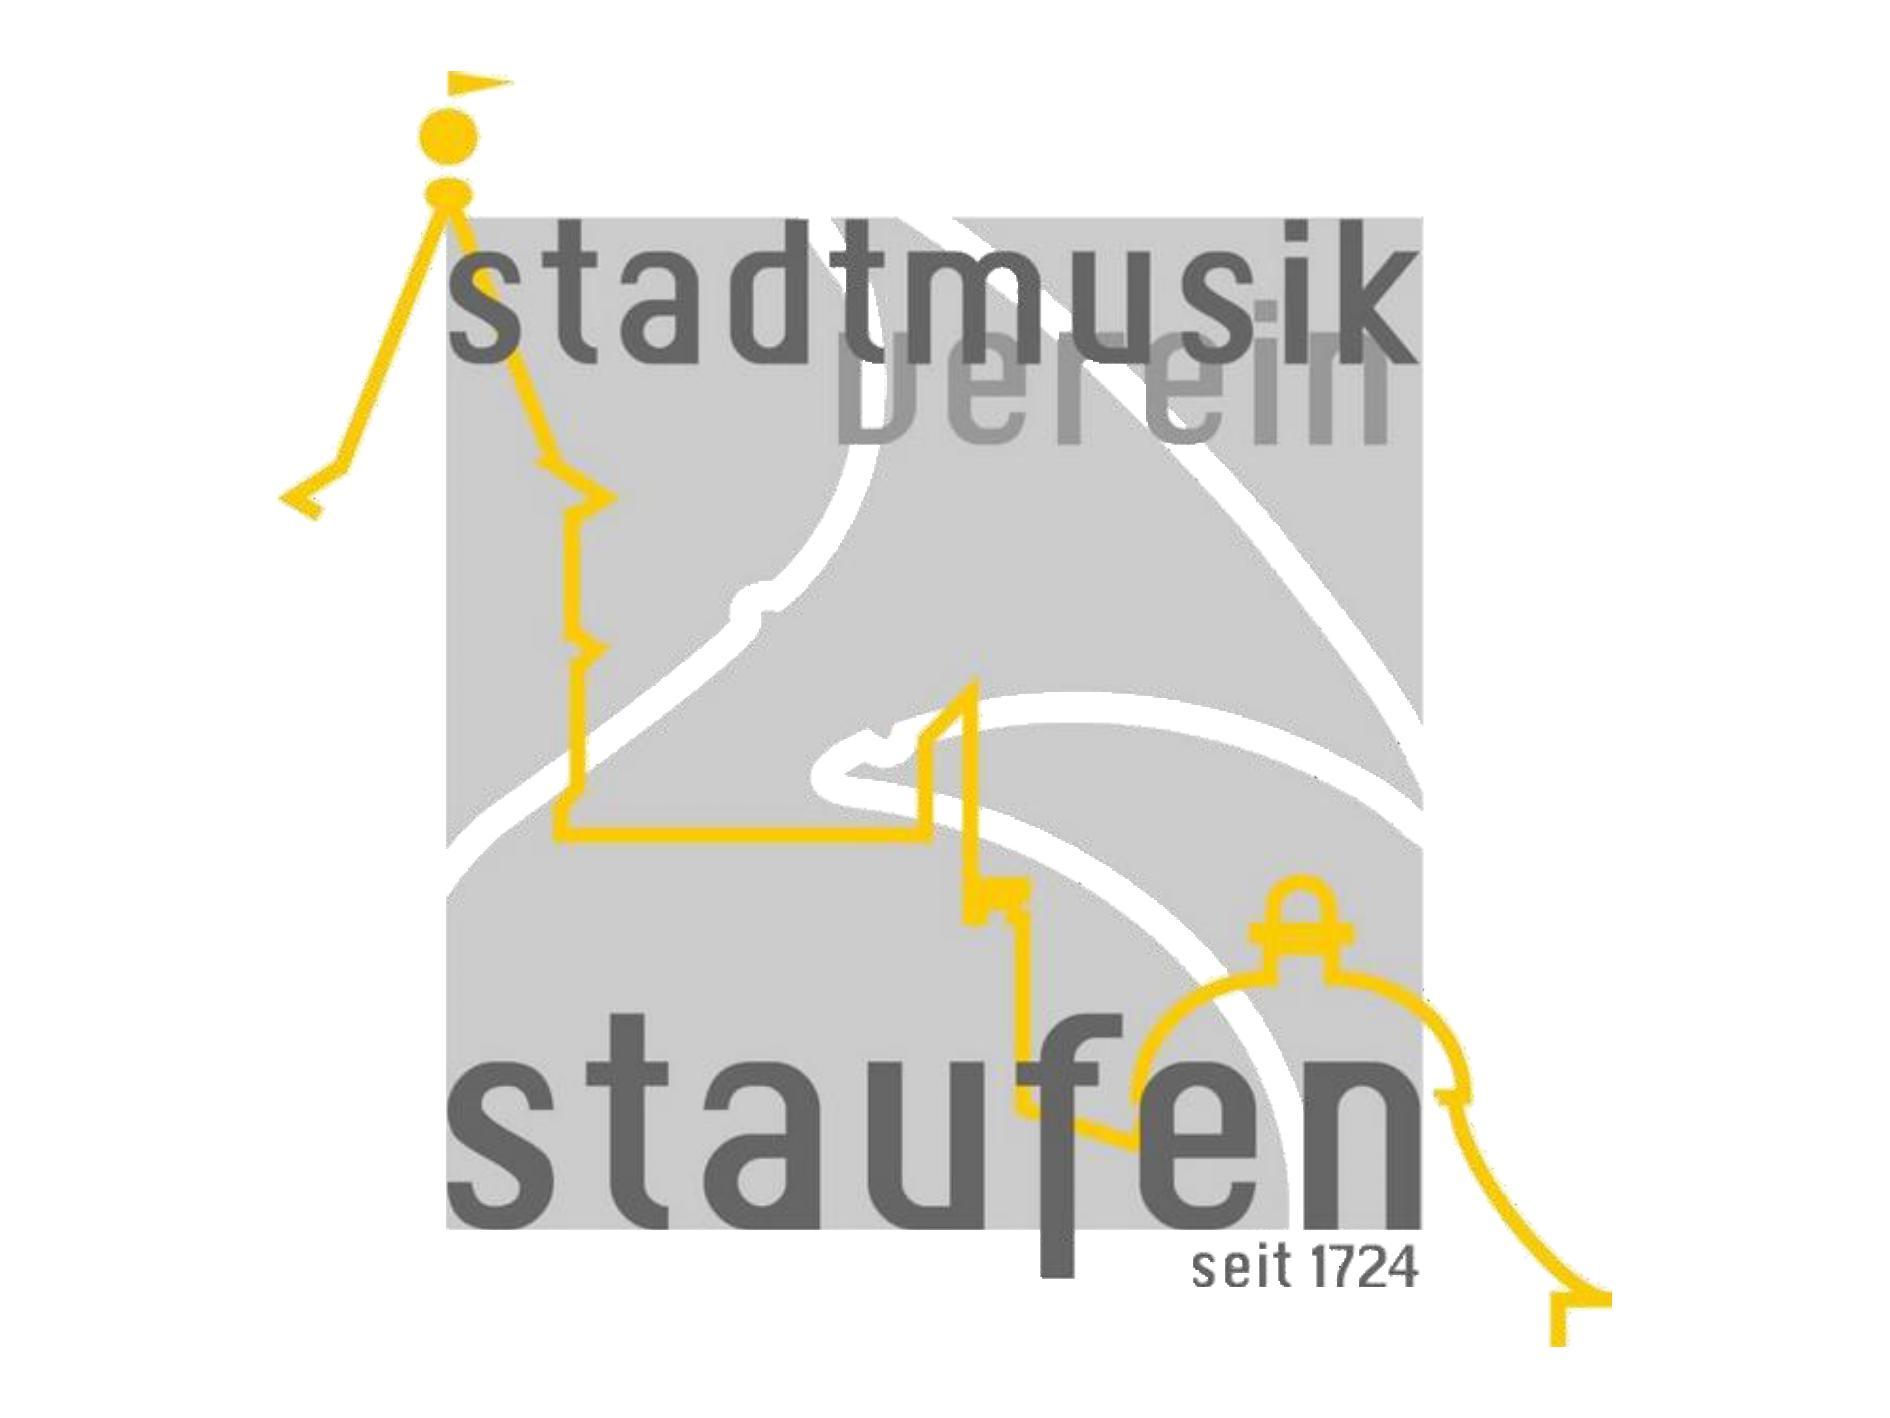 Stadtmusikverein Staufen